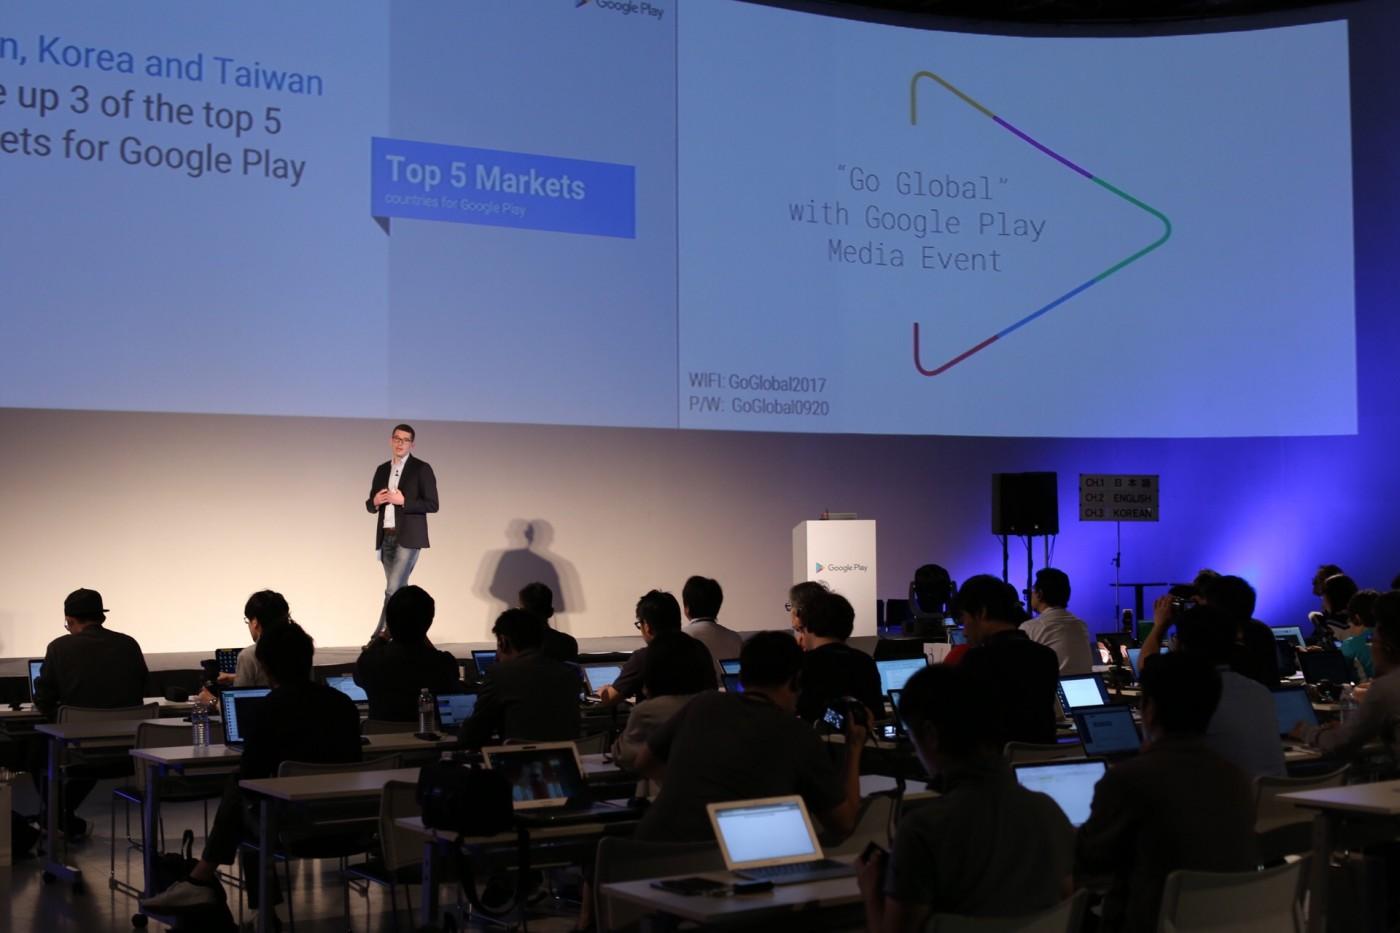 Google Play:我們相當重視與獨立遊戲開發者的合作關係